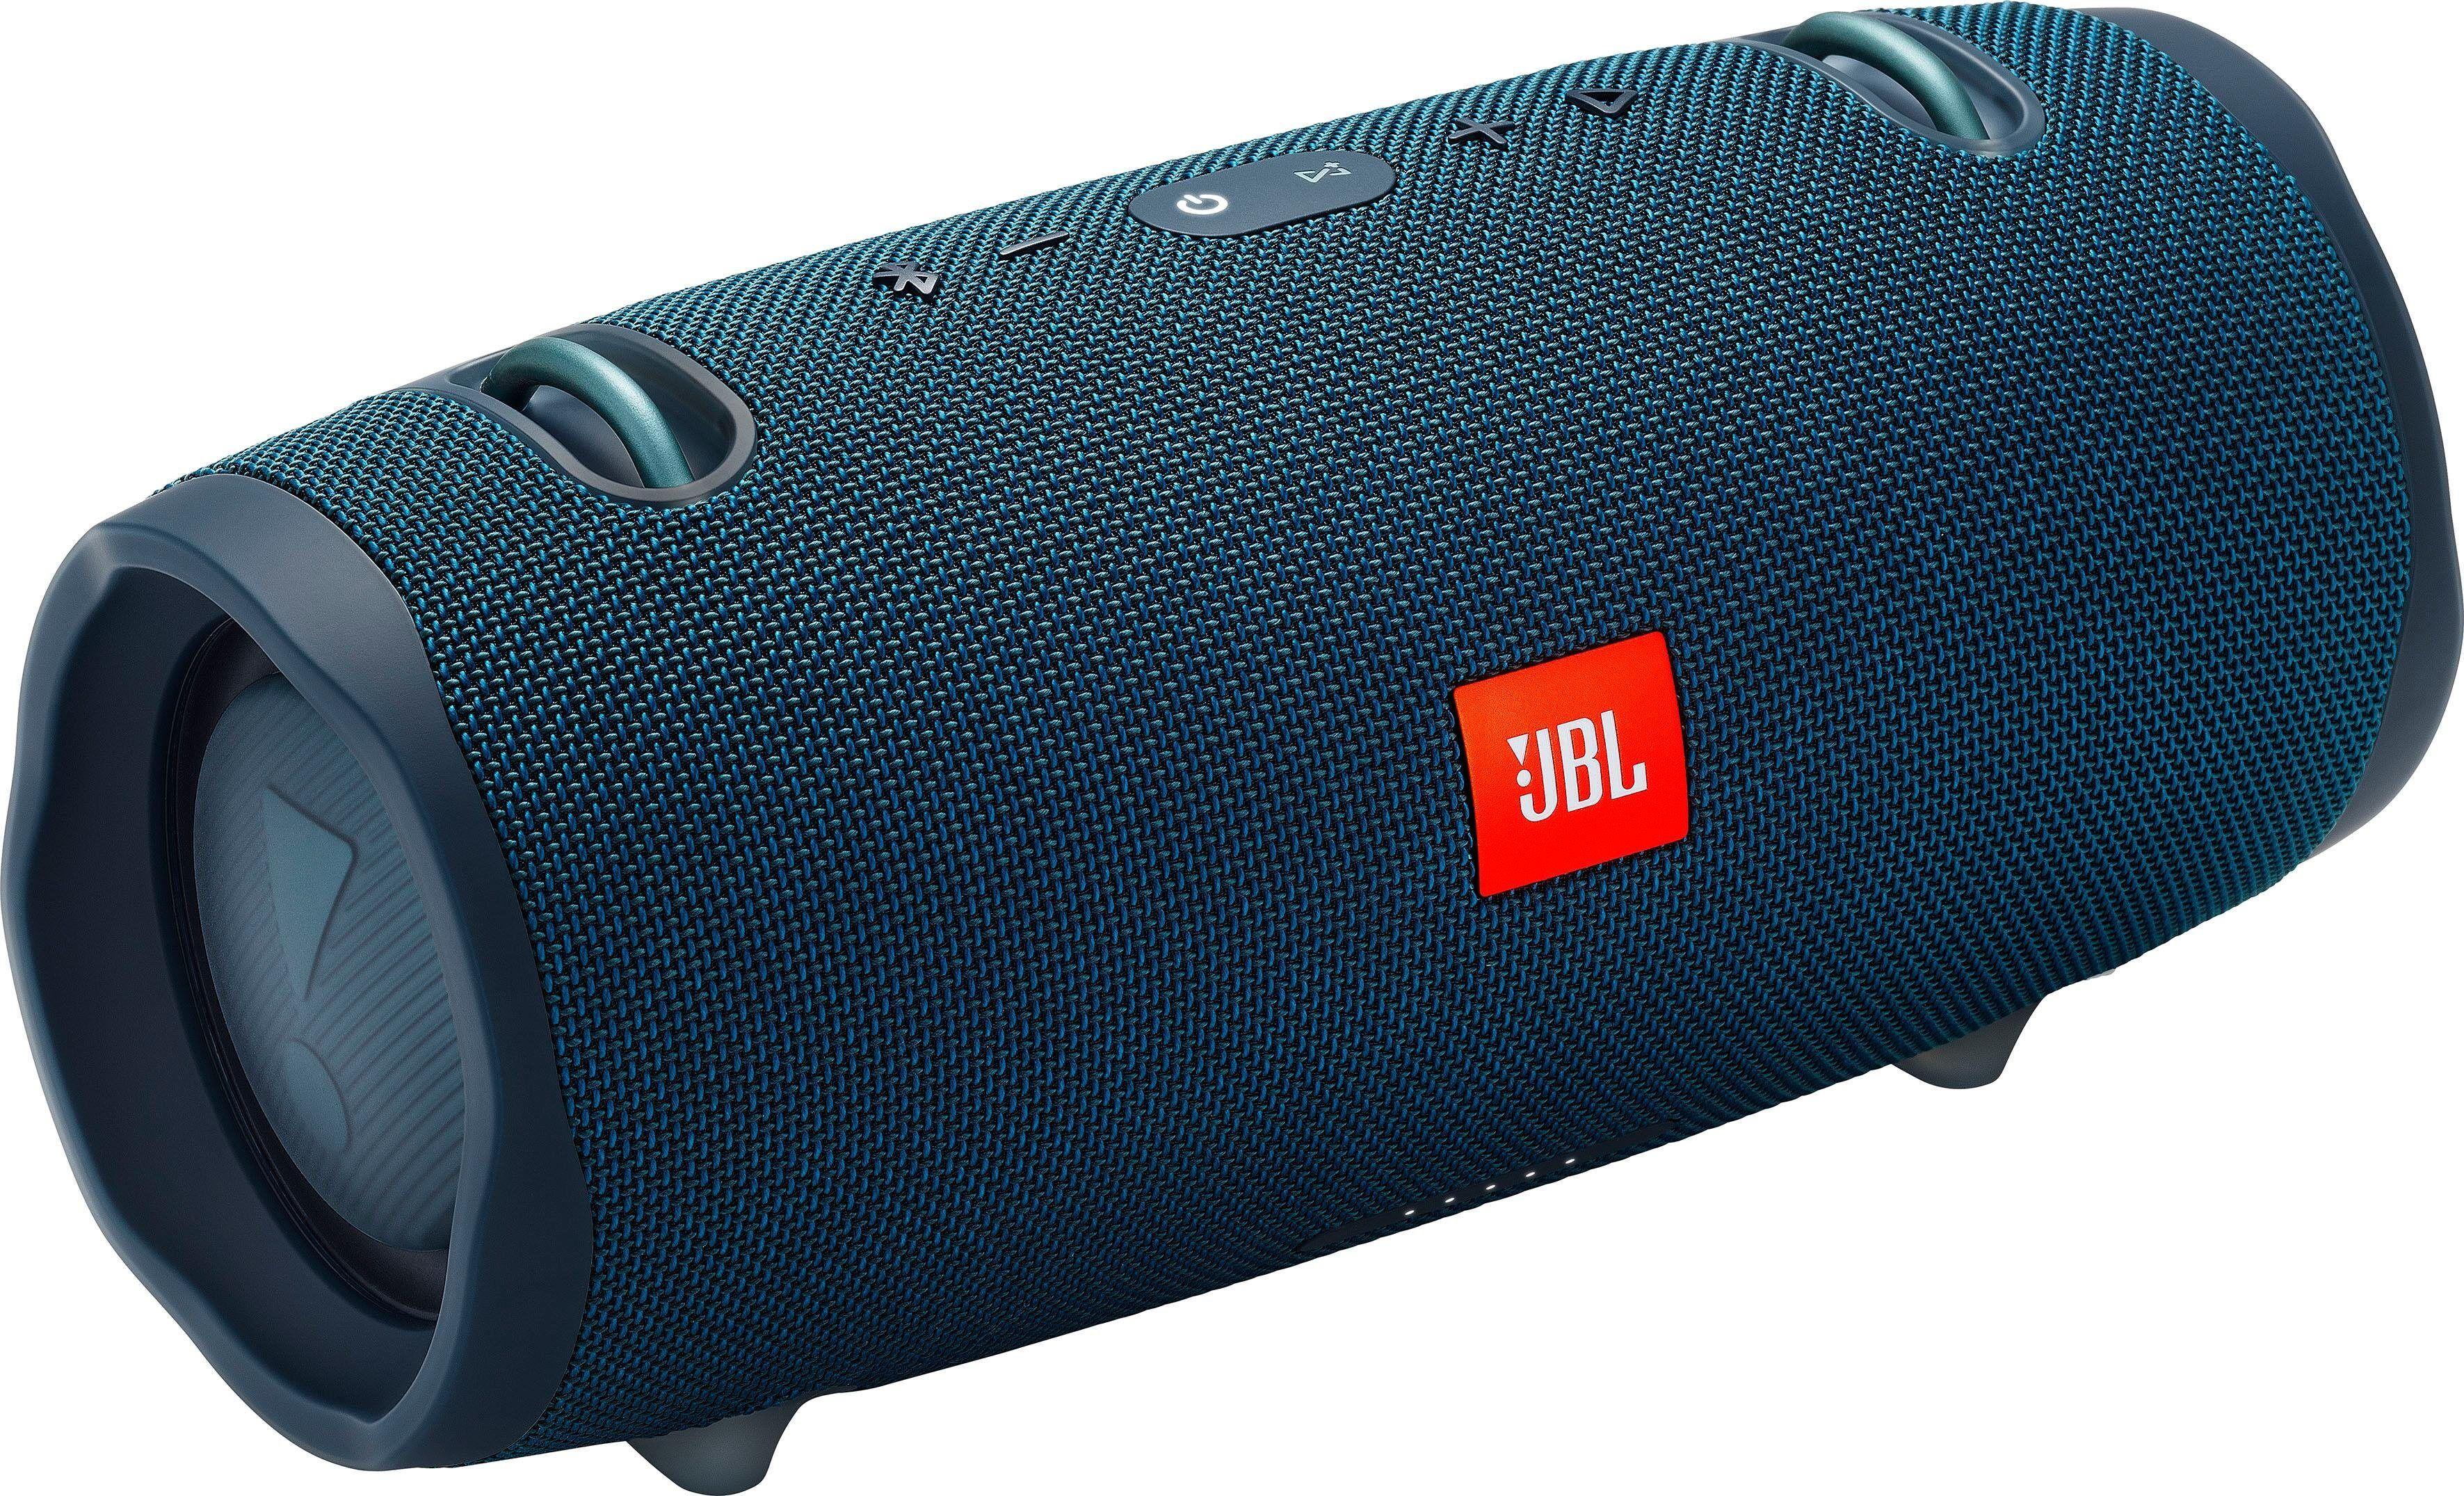 JBL Xtreme 2 ein Portable-Lautsprecher (Bluetooth, 40 W), blau